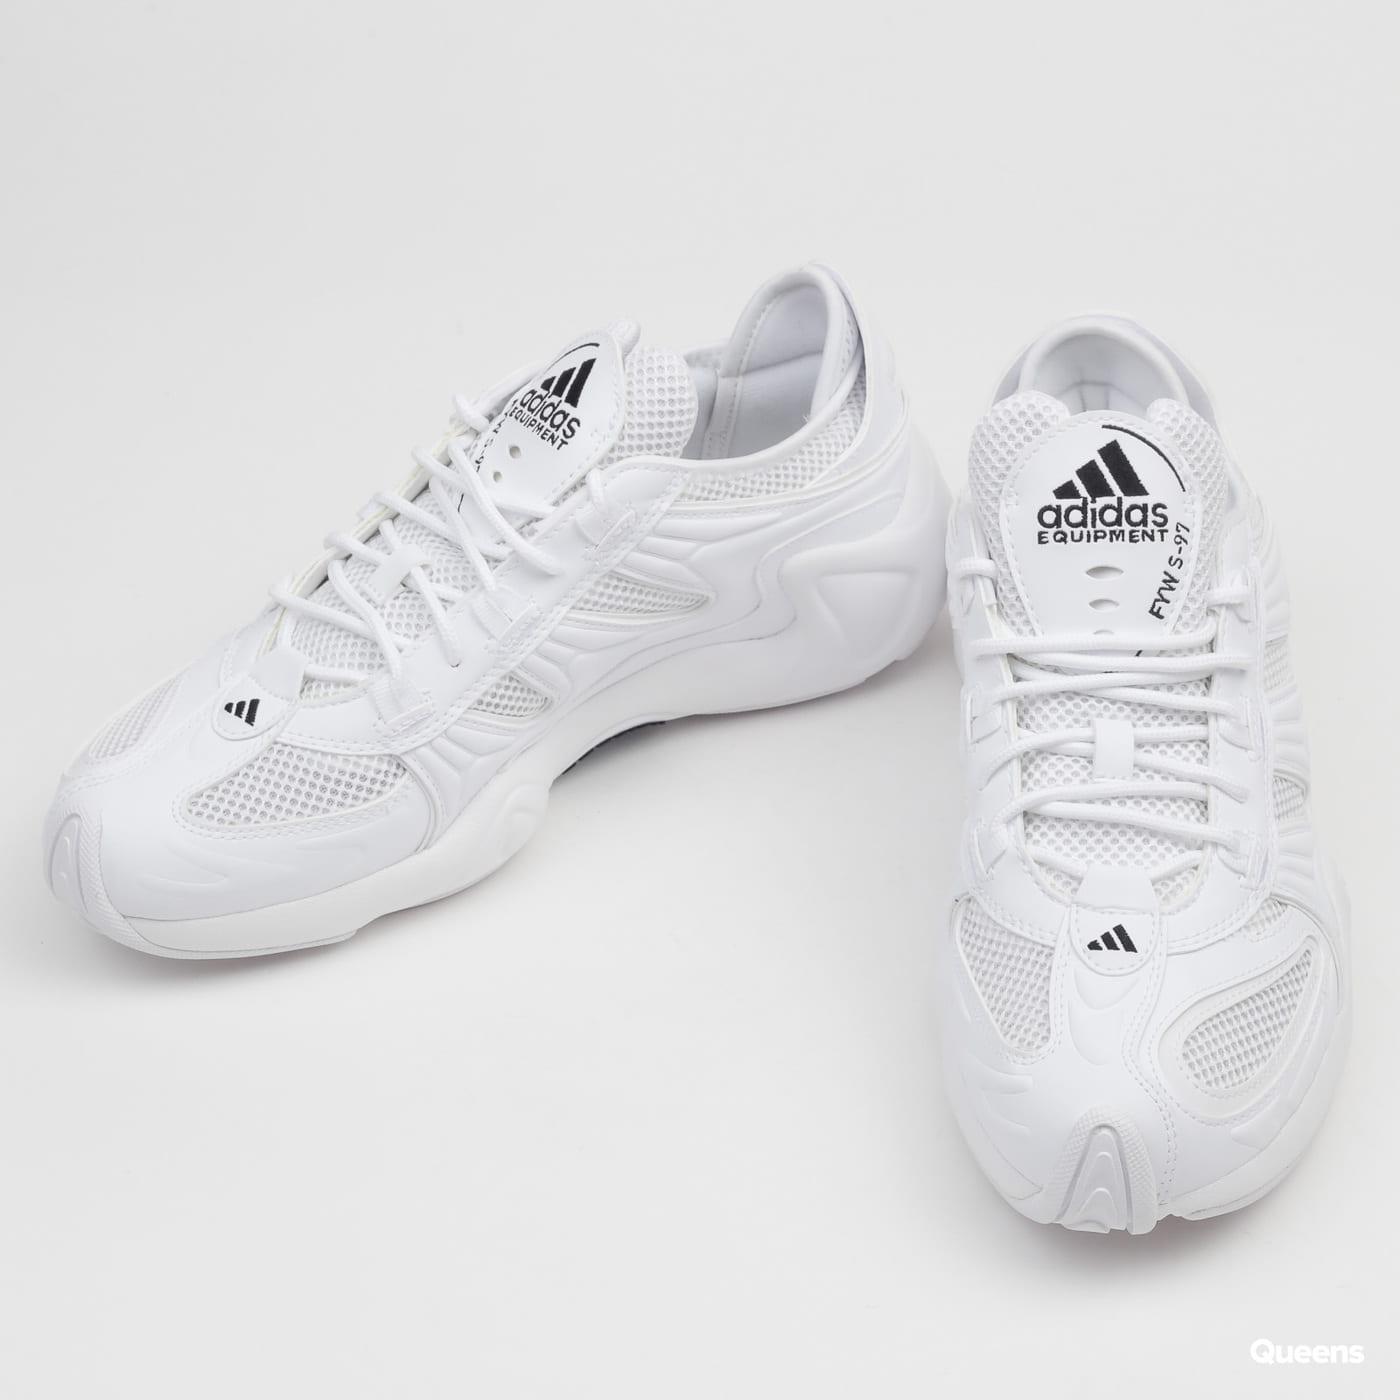 adidas Originals FYW-S-97 ftwwht / ftwwht / cblack